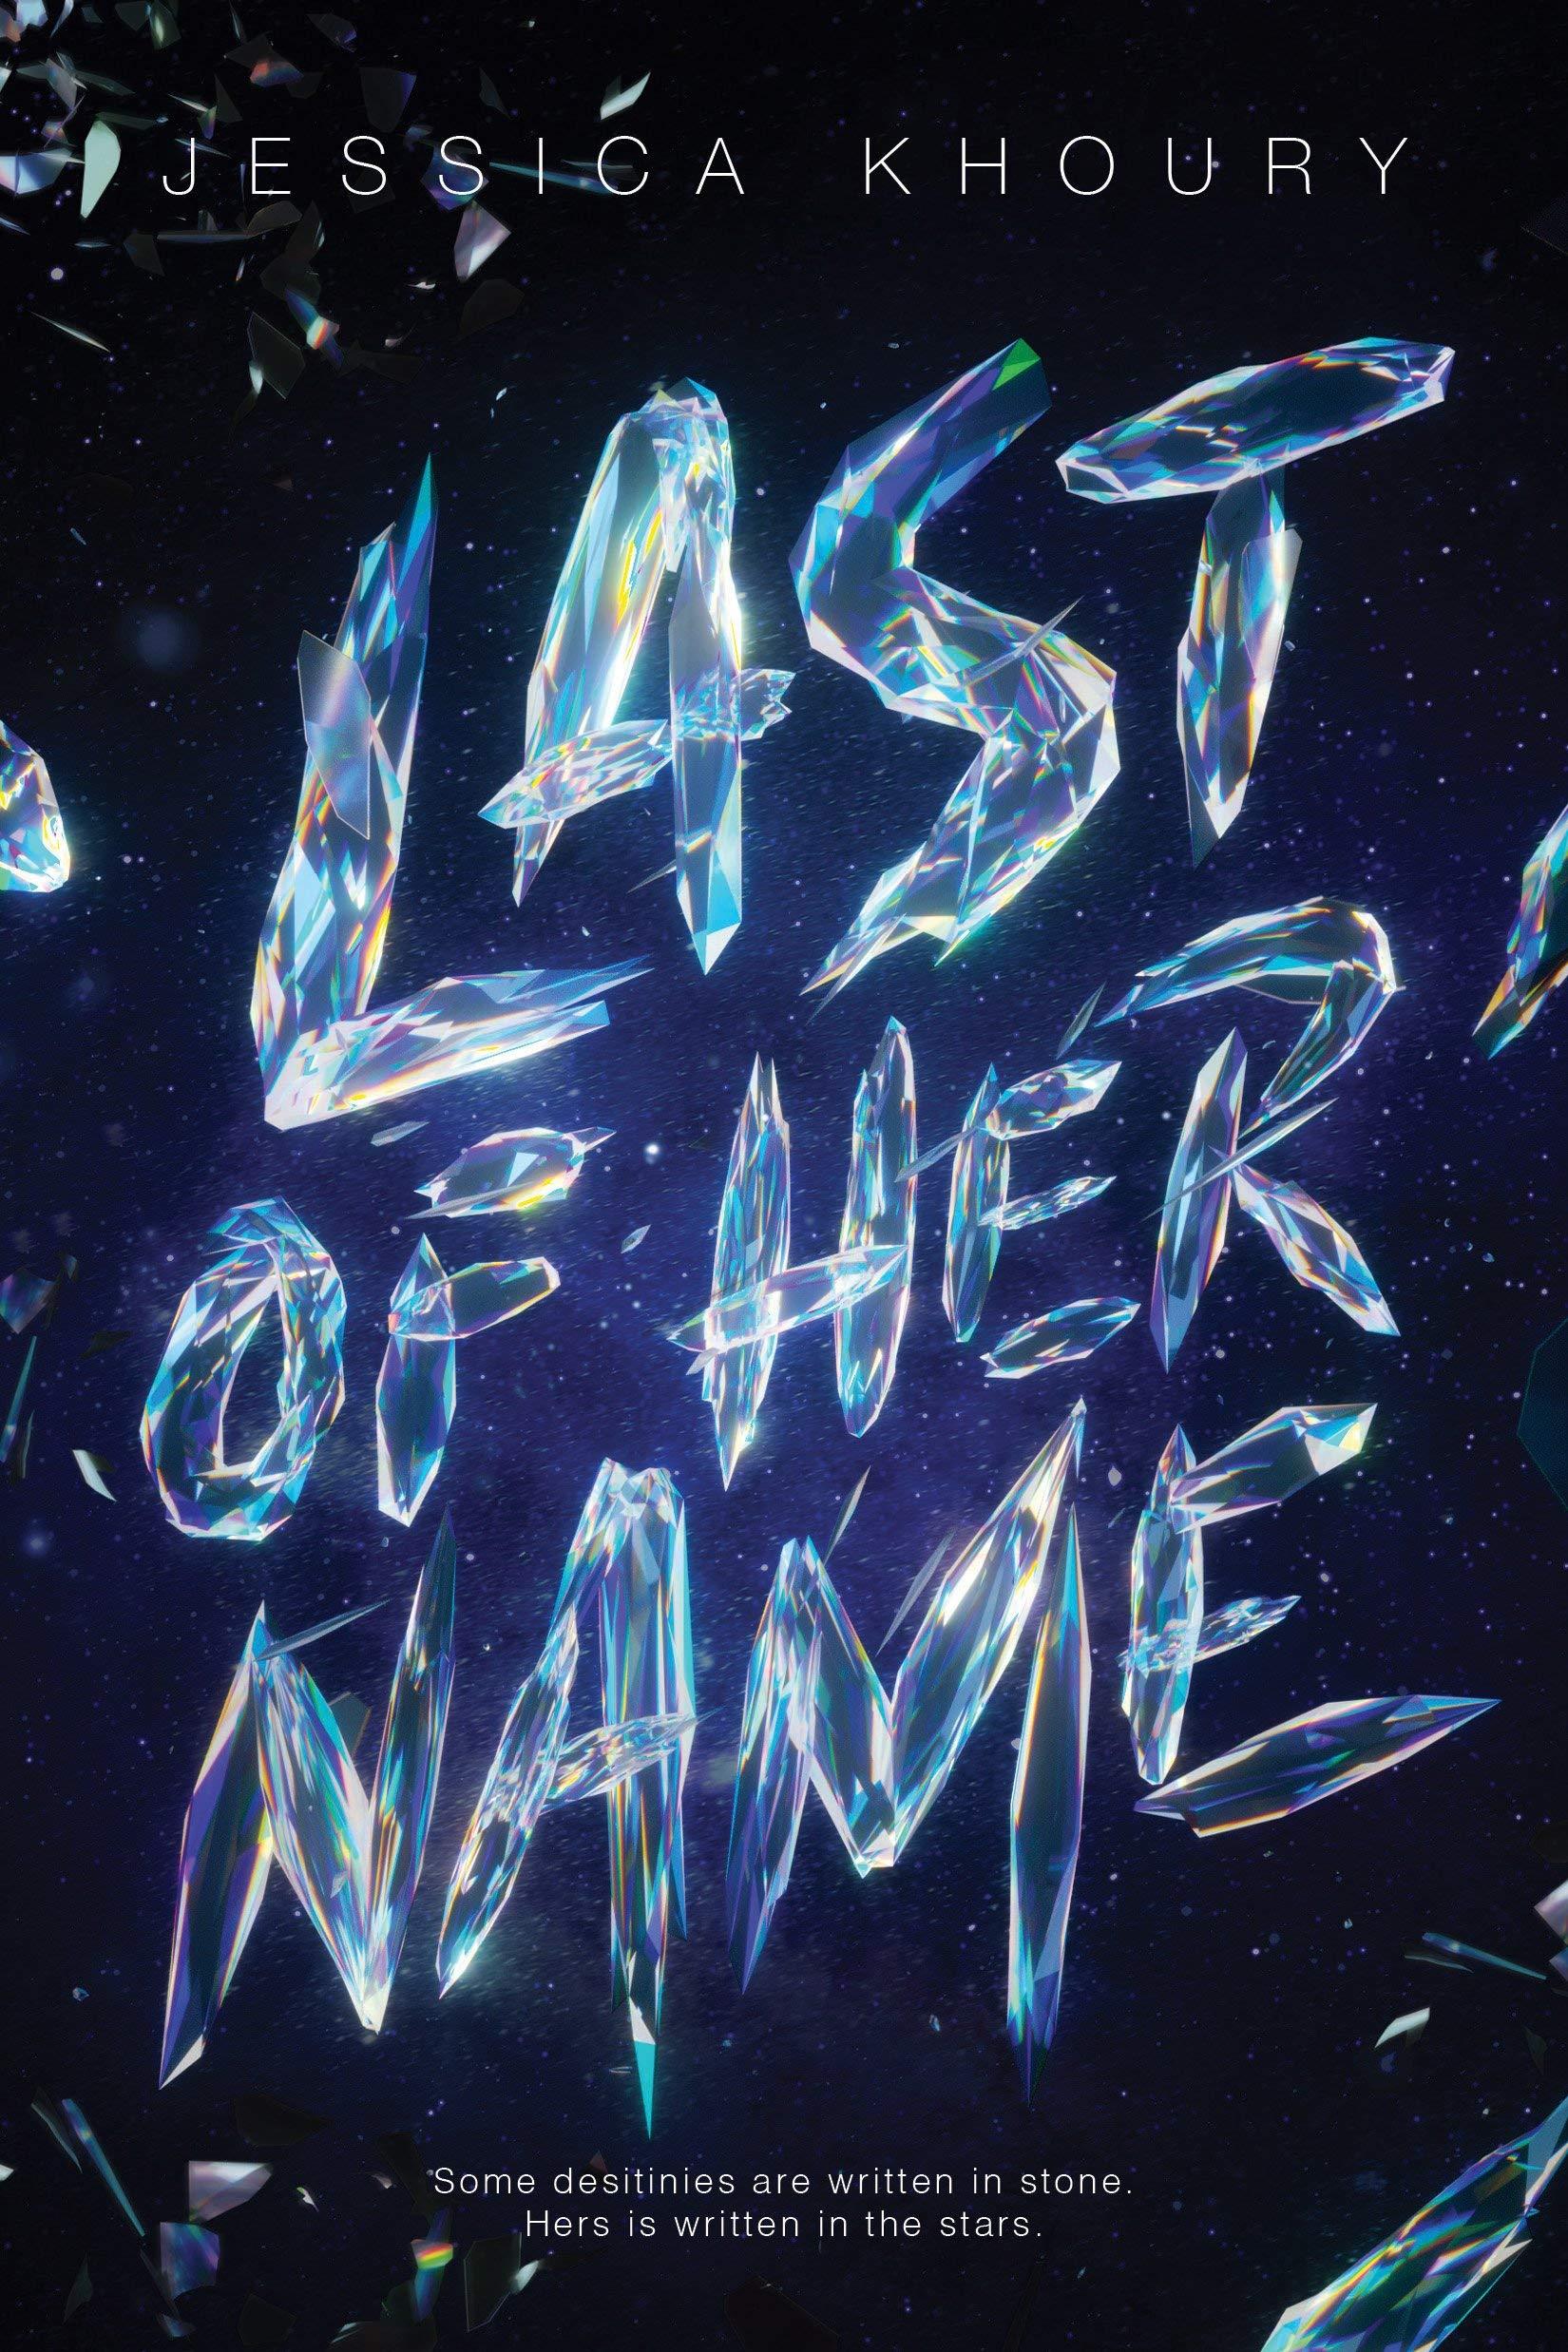 Amazon.com: Last of Her Name (9781338243369): Khoury, Jessica: Books